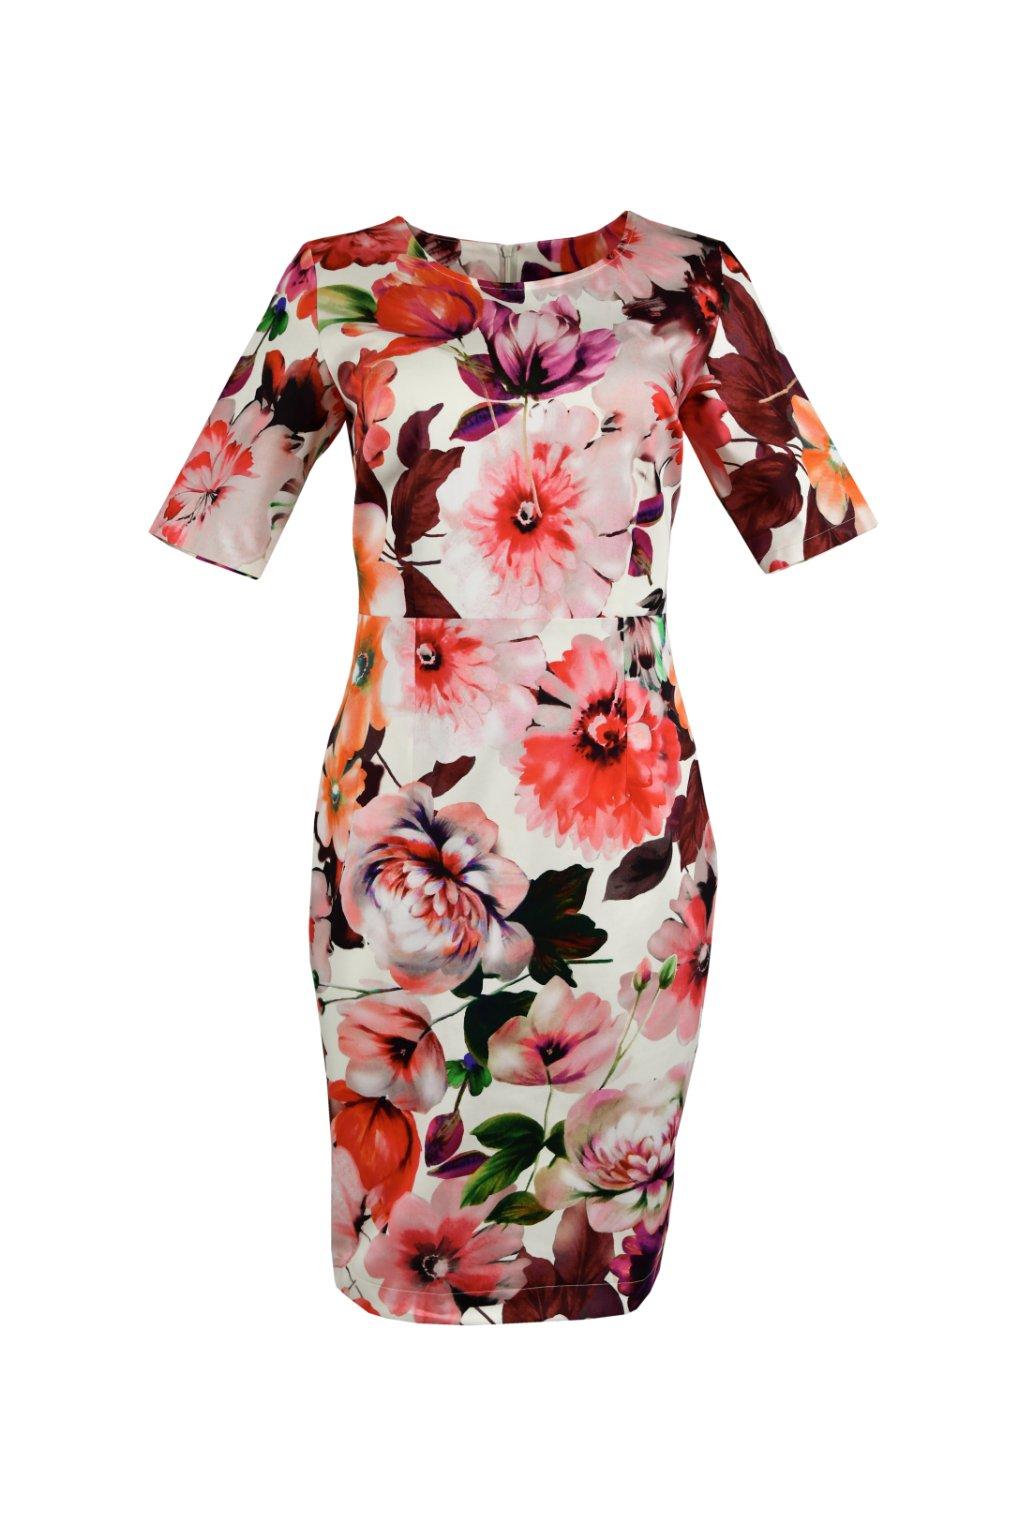 damske-puzdrove-kvetovane-saty-alison-cut-farebne-0